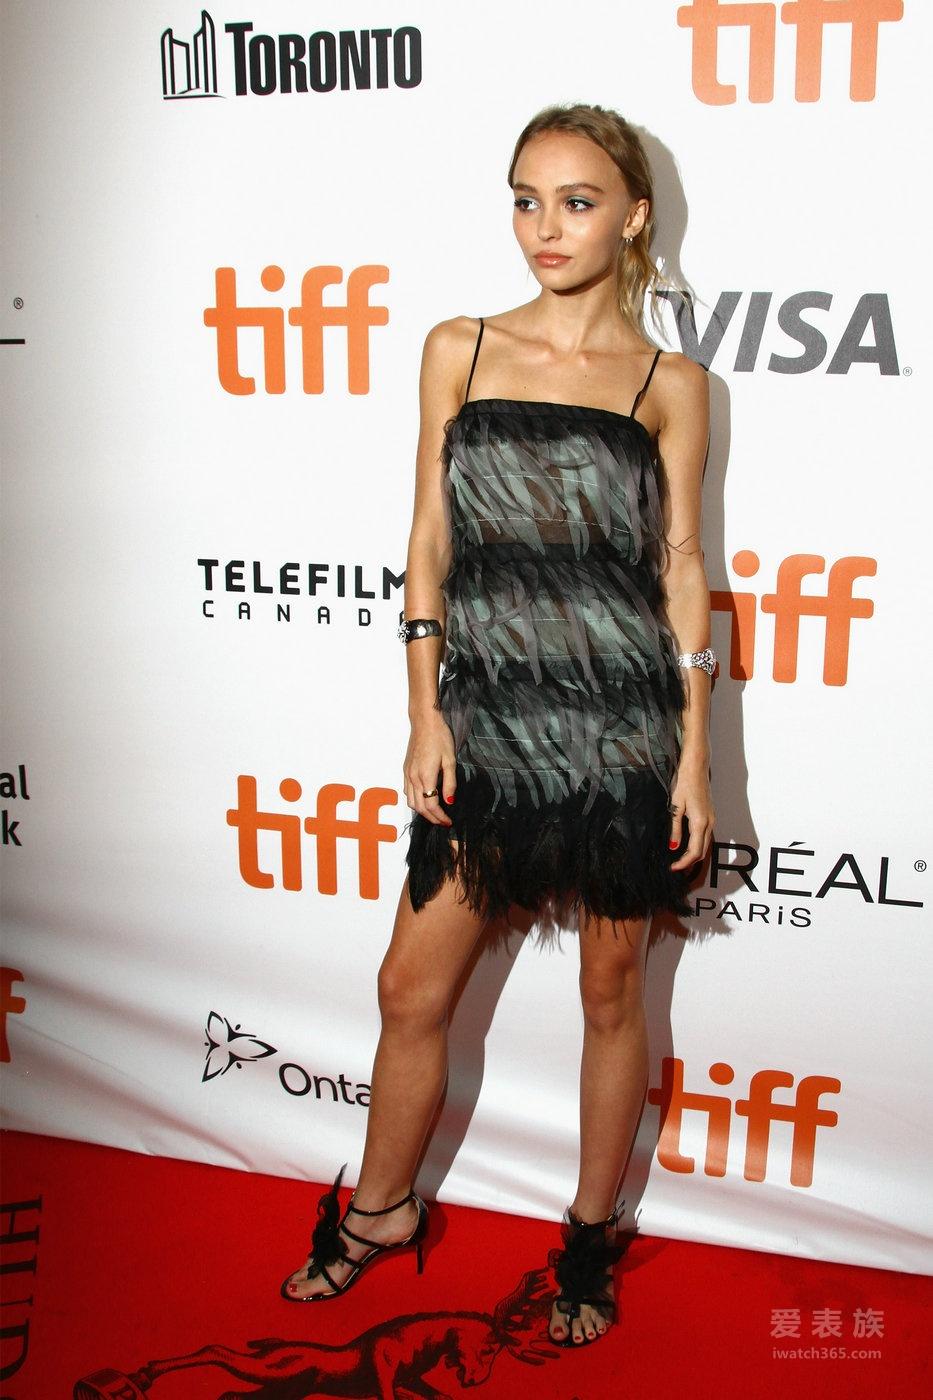 香奈儿——CHANEL 明星着装 | Lily-Rose Depp,Emma Stone出席多伦多国际电影节